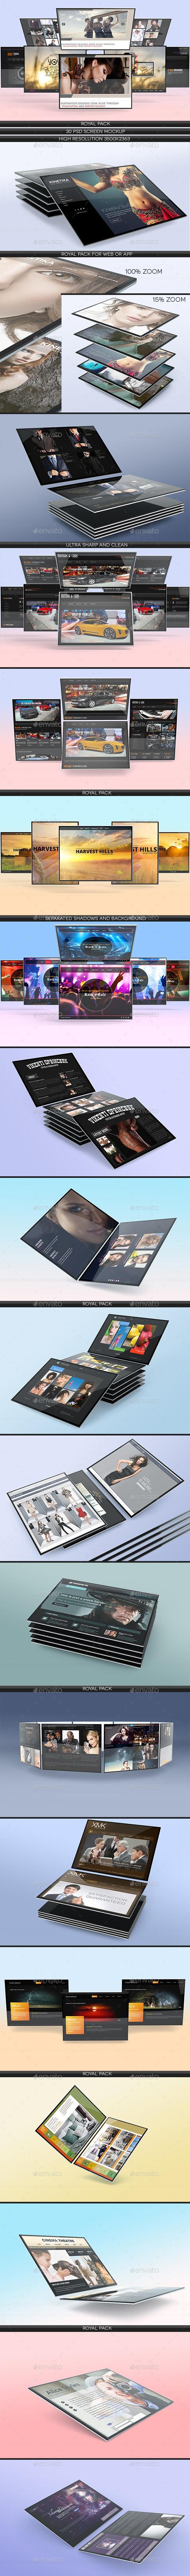 Screen Mockup Pack - Displays Product Mock-Ups